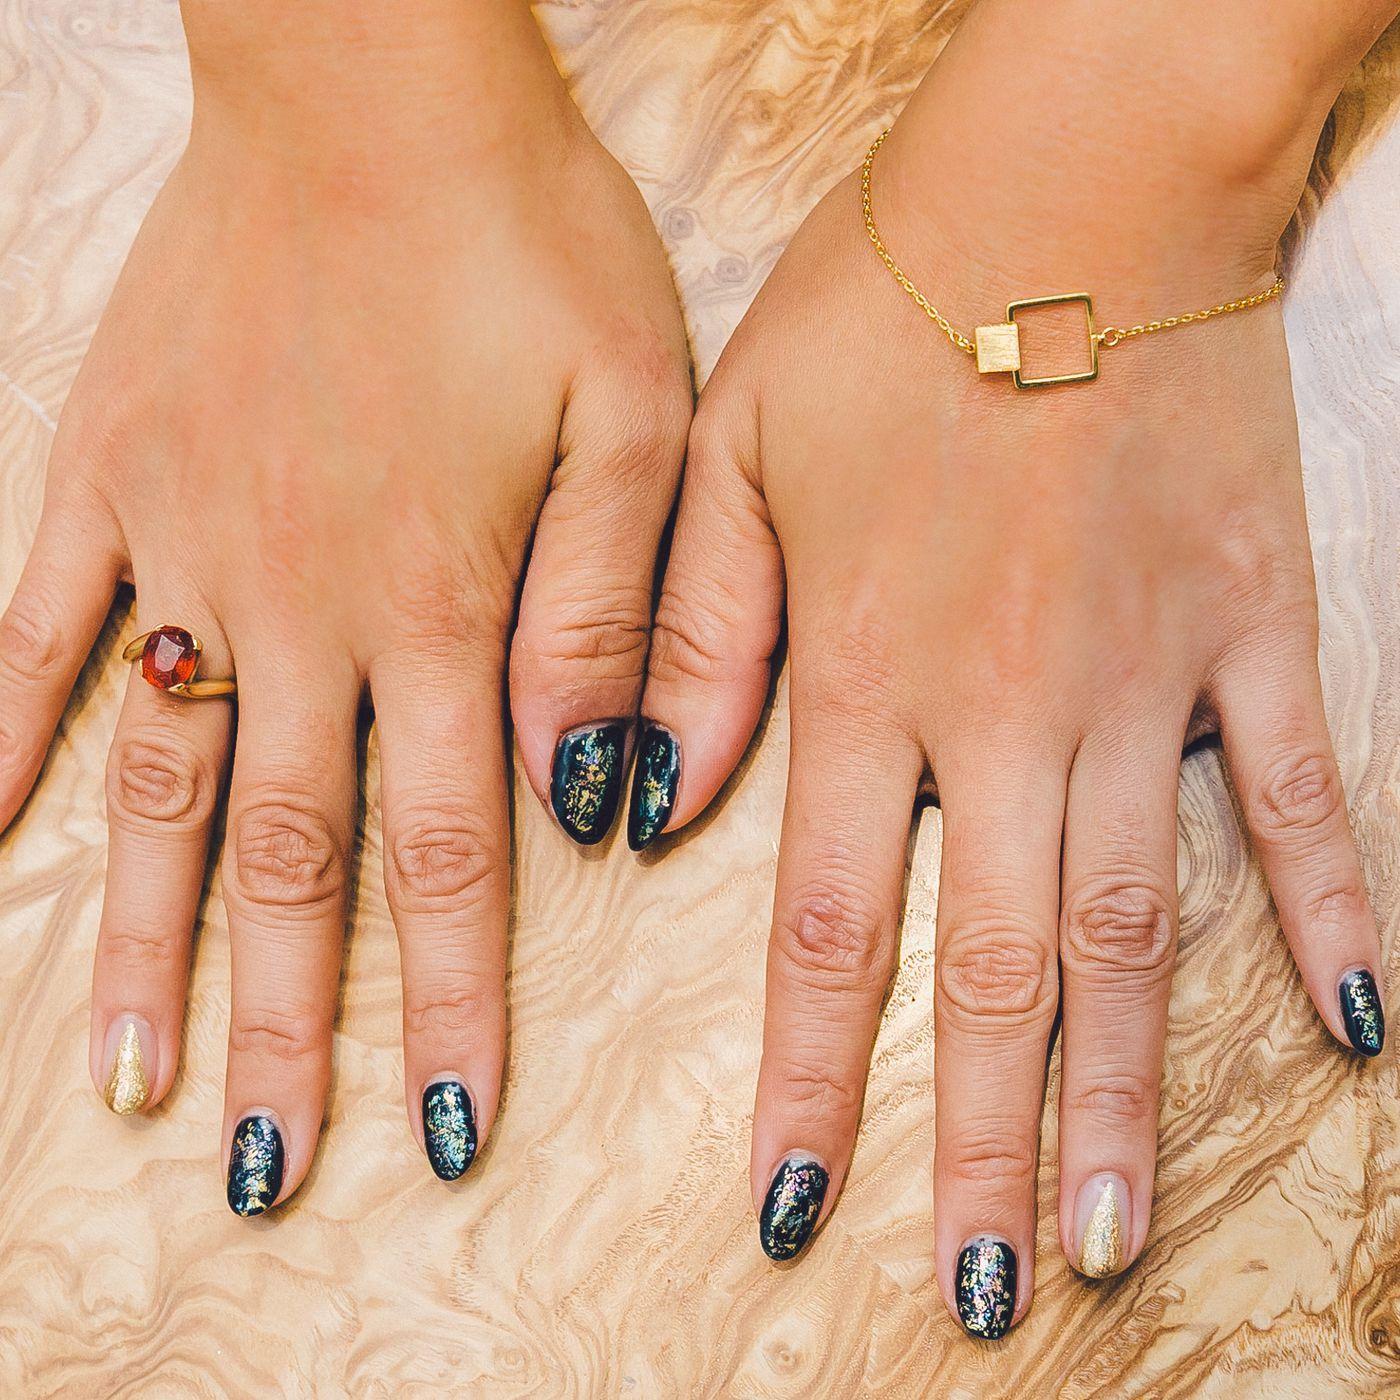 Code nail polish femme flagging Trendy or